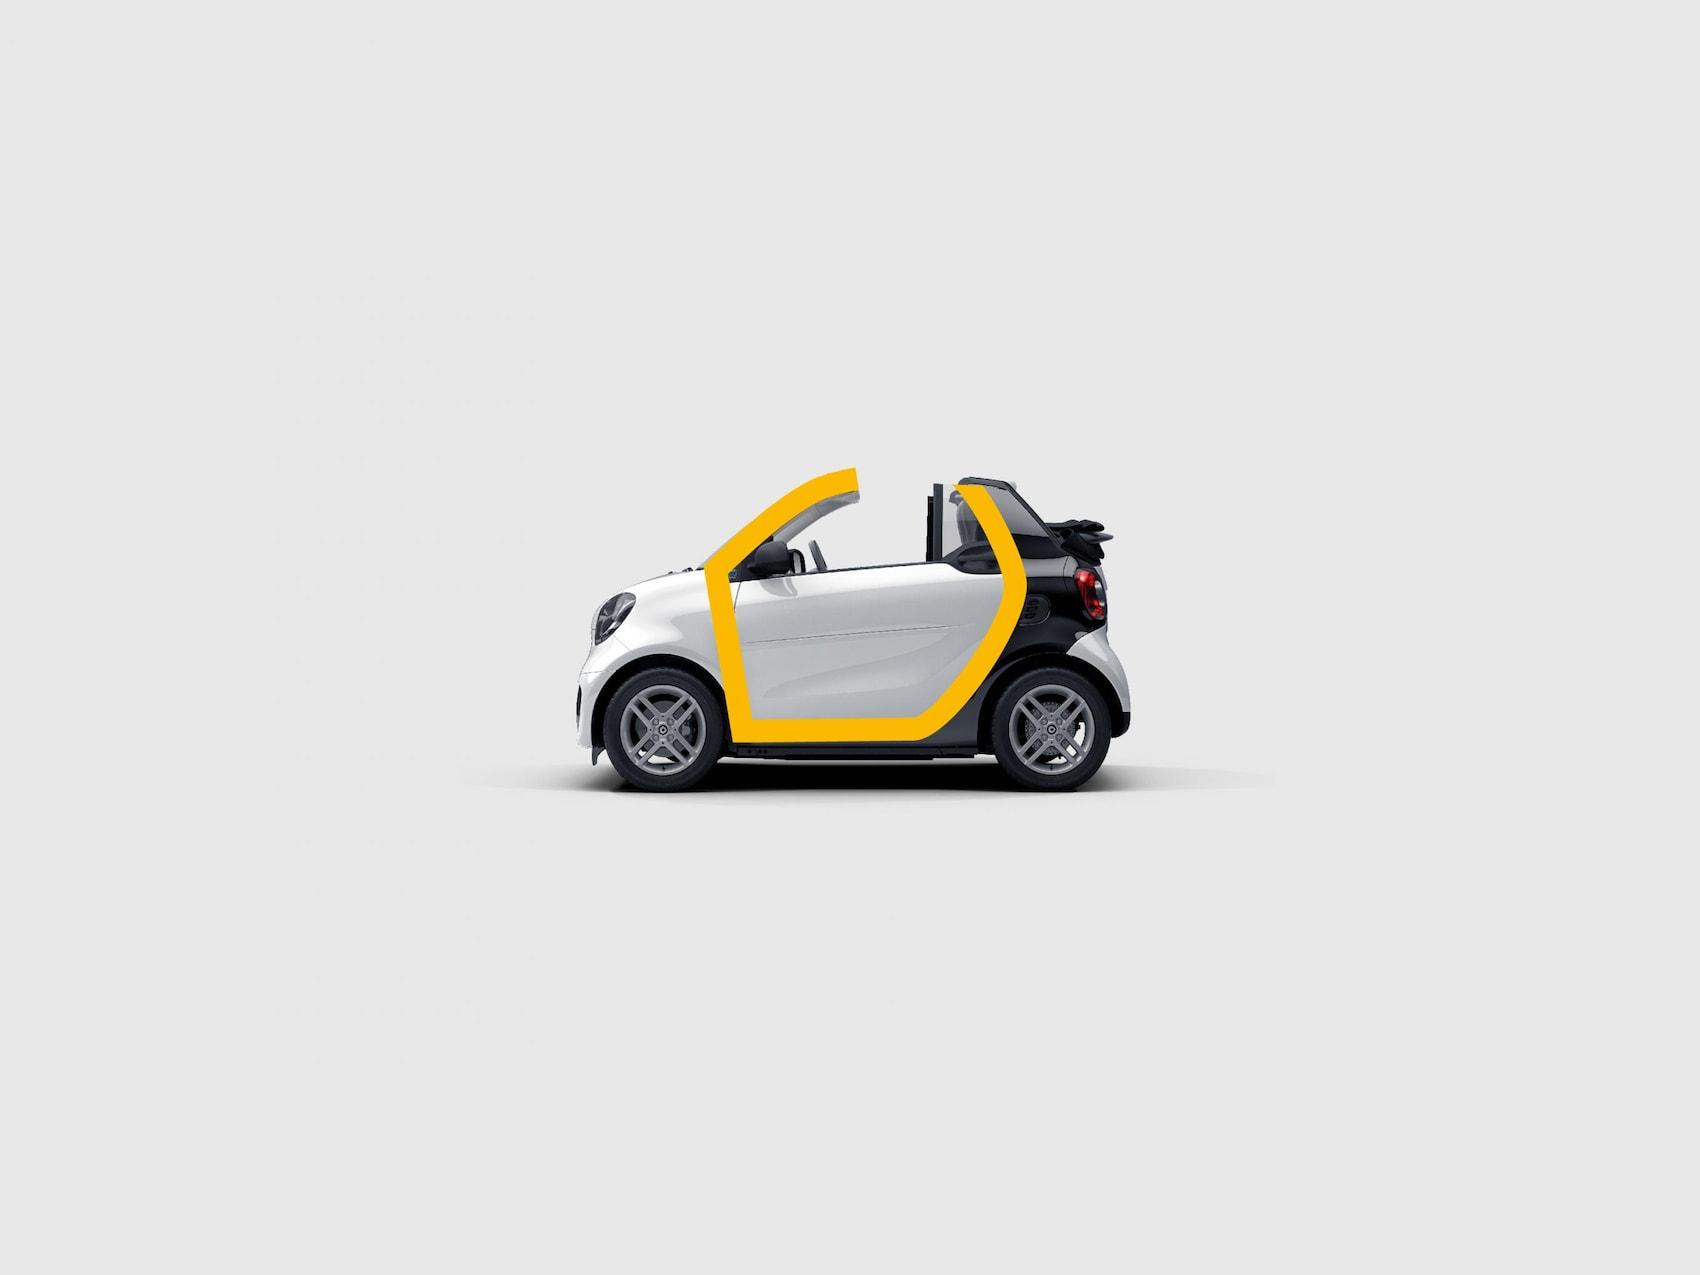 smart EQ fortwo kabriolet: tridion